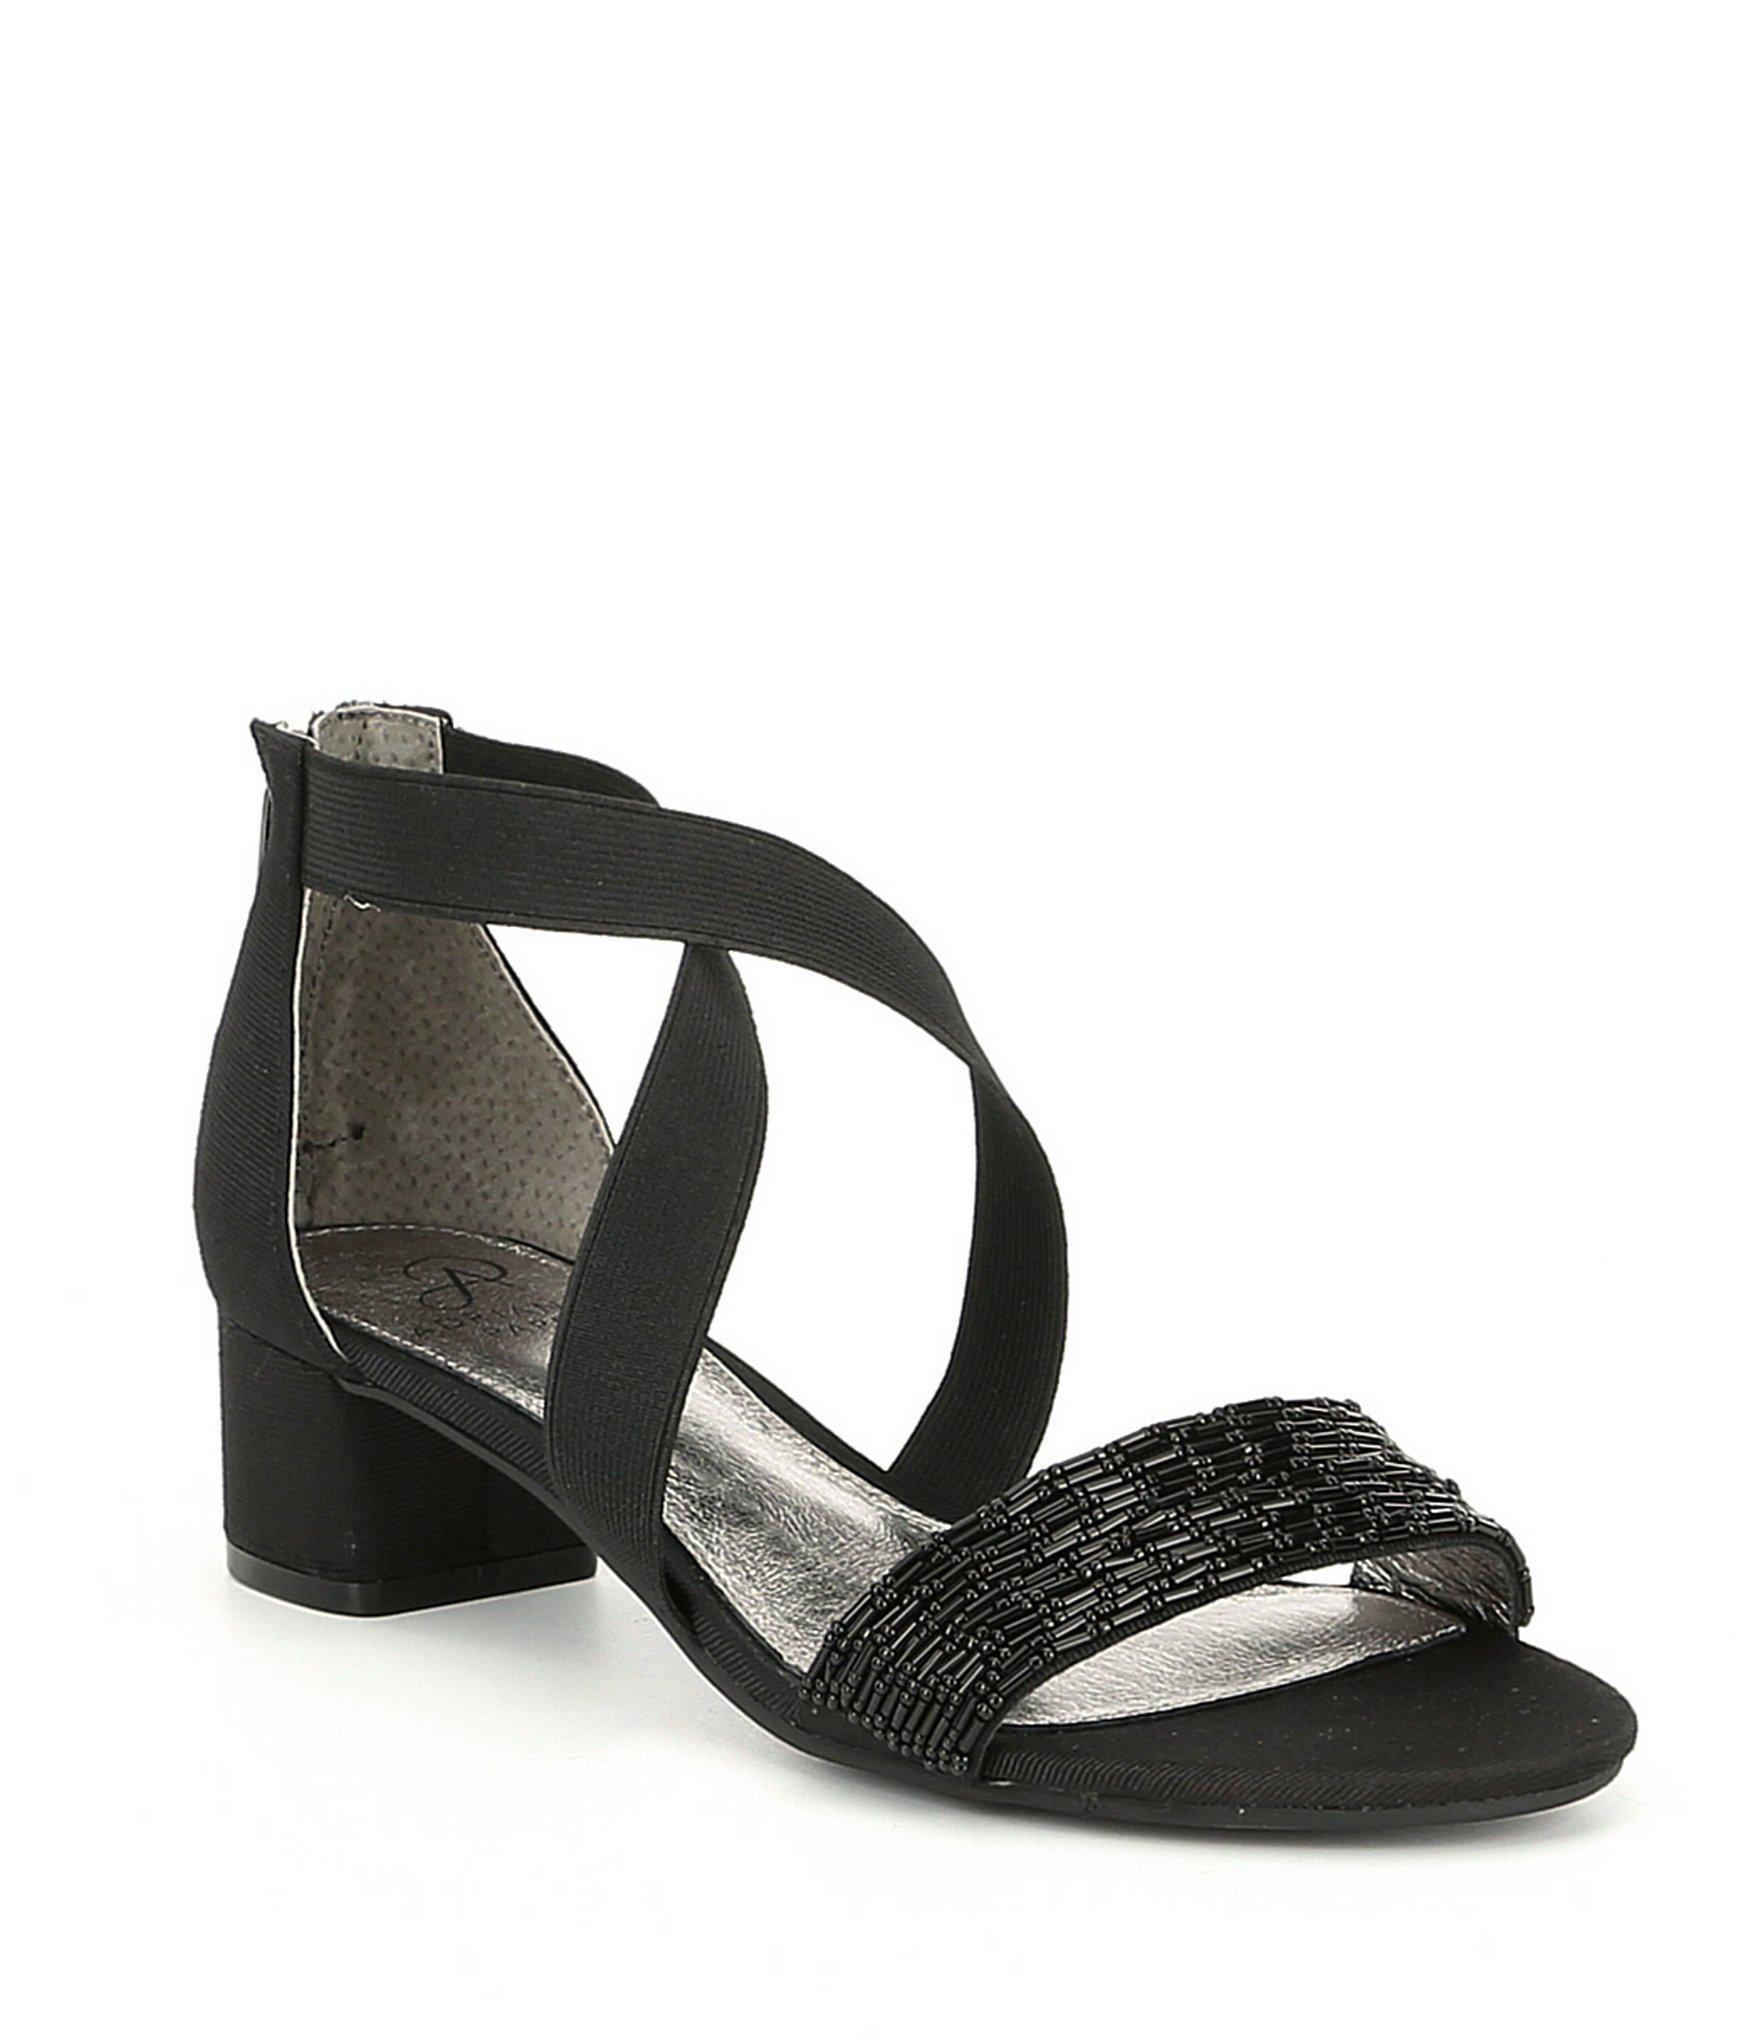 992fbaf66 Adrianna Papell Teagan Beaded Block Heel Dress Sandals in Black - Lyst